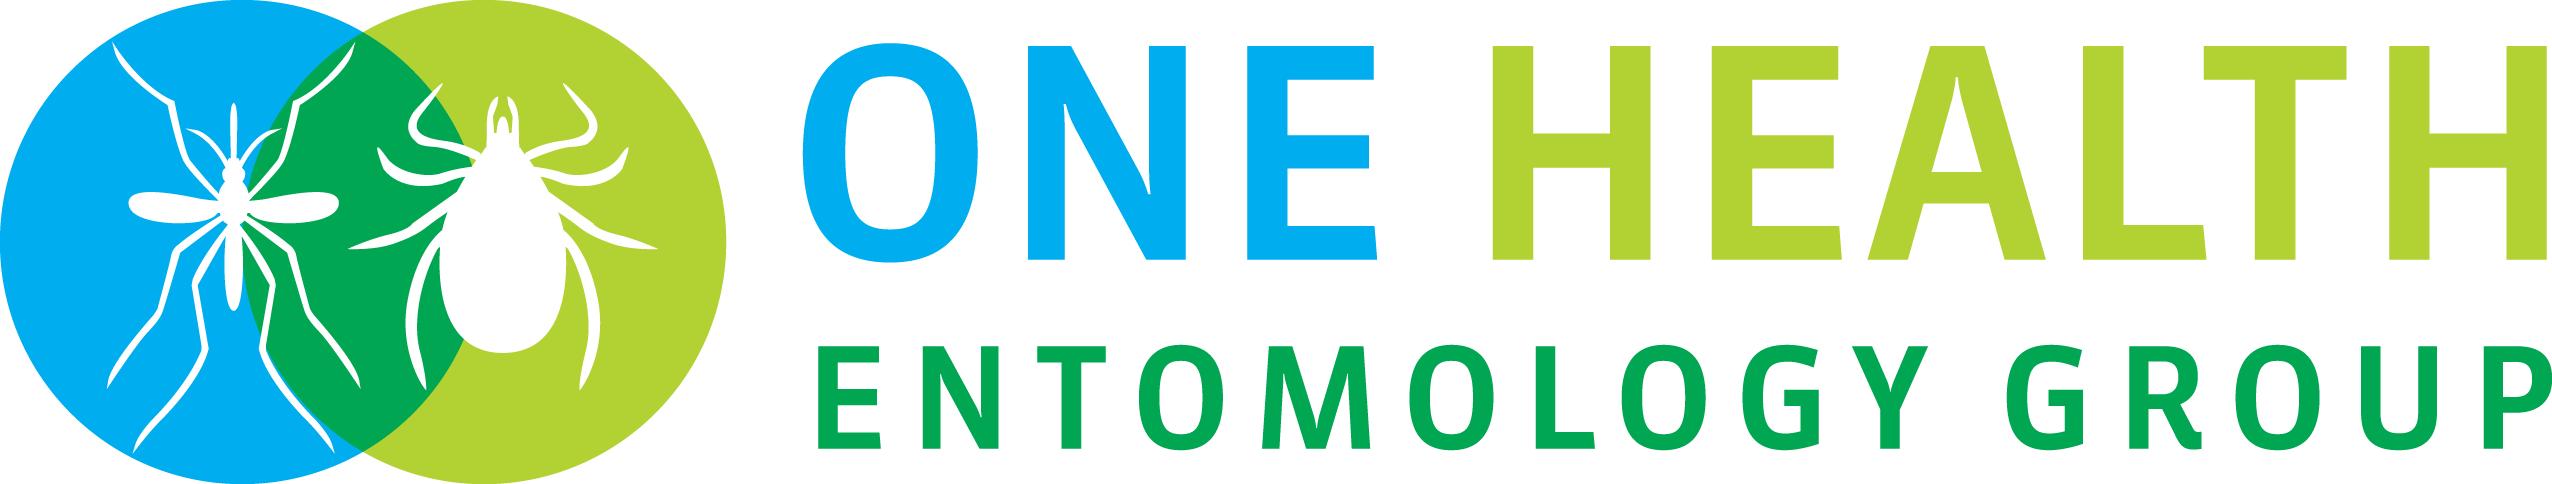 One Health Entomology Group